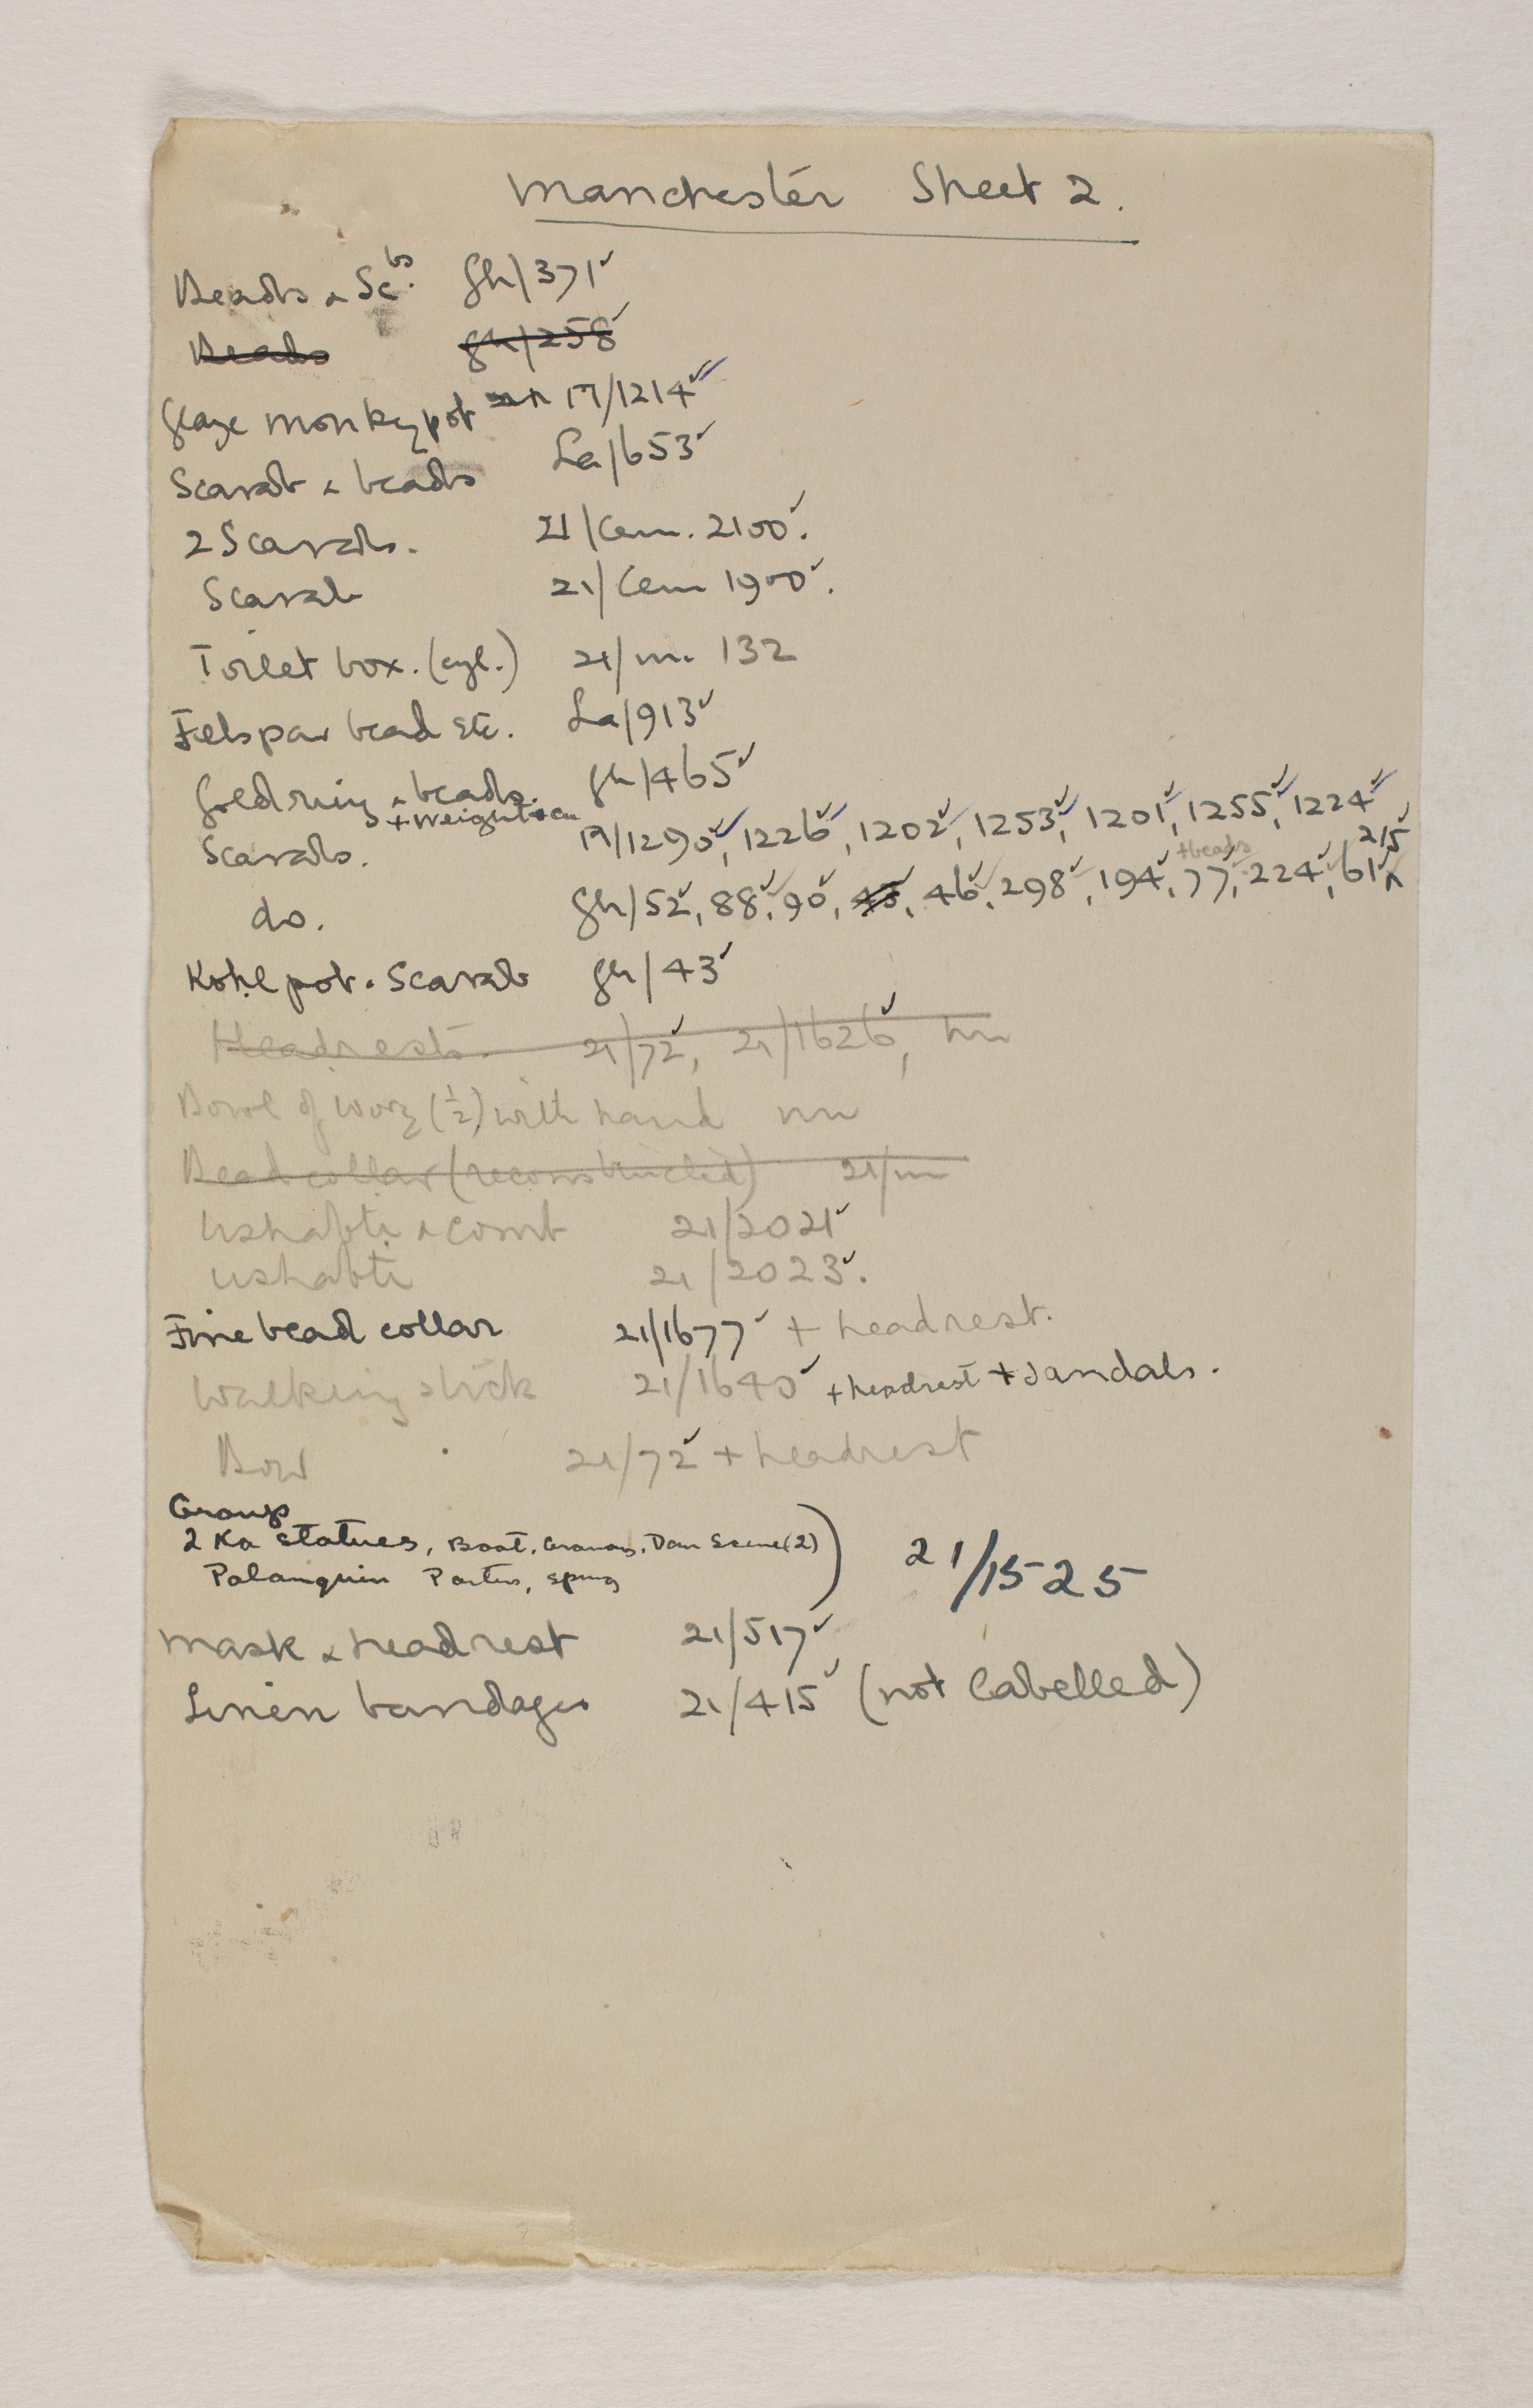 1919-21 Sedment, Lahun Individual institution list PMA/WFP1/D/24/34.2